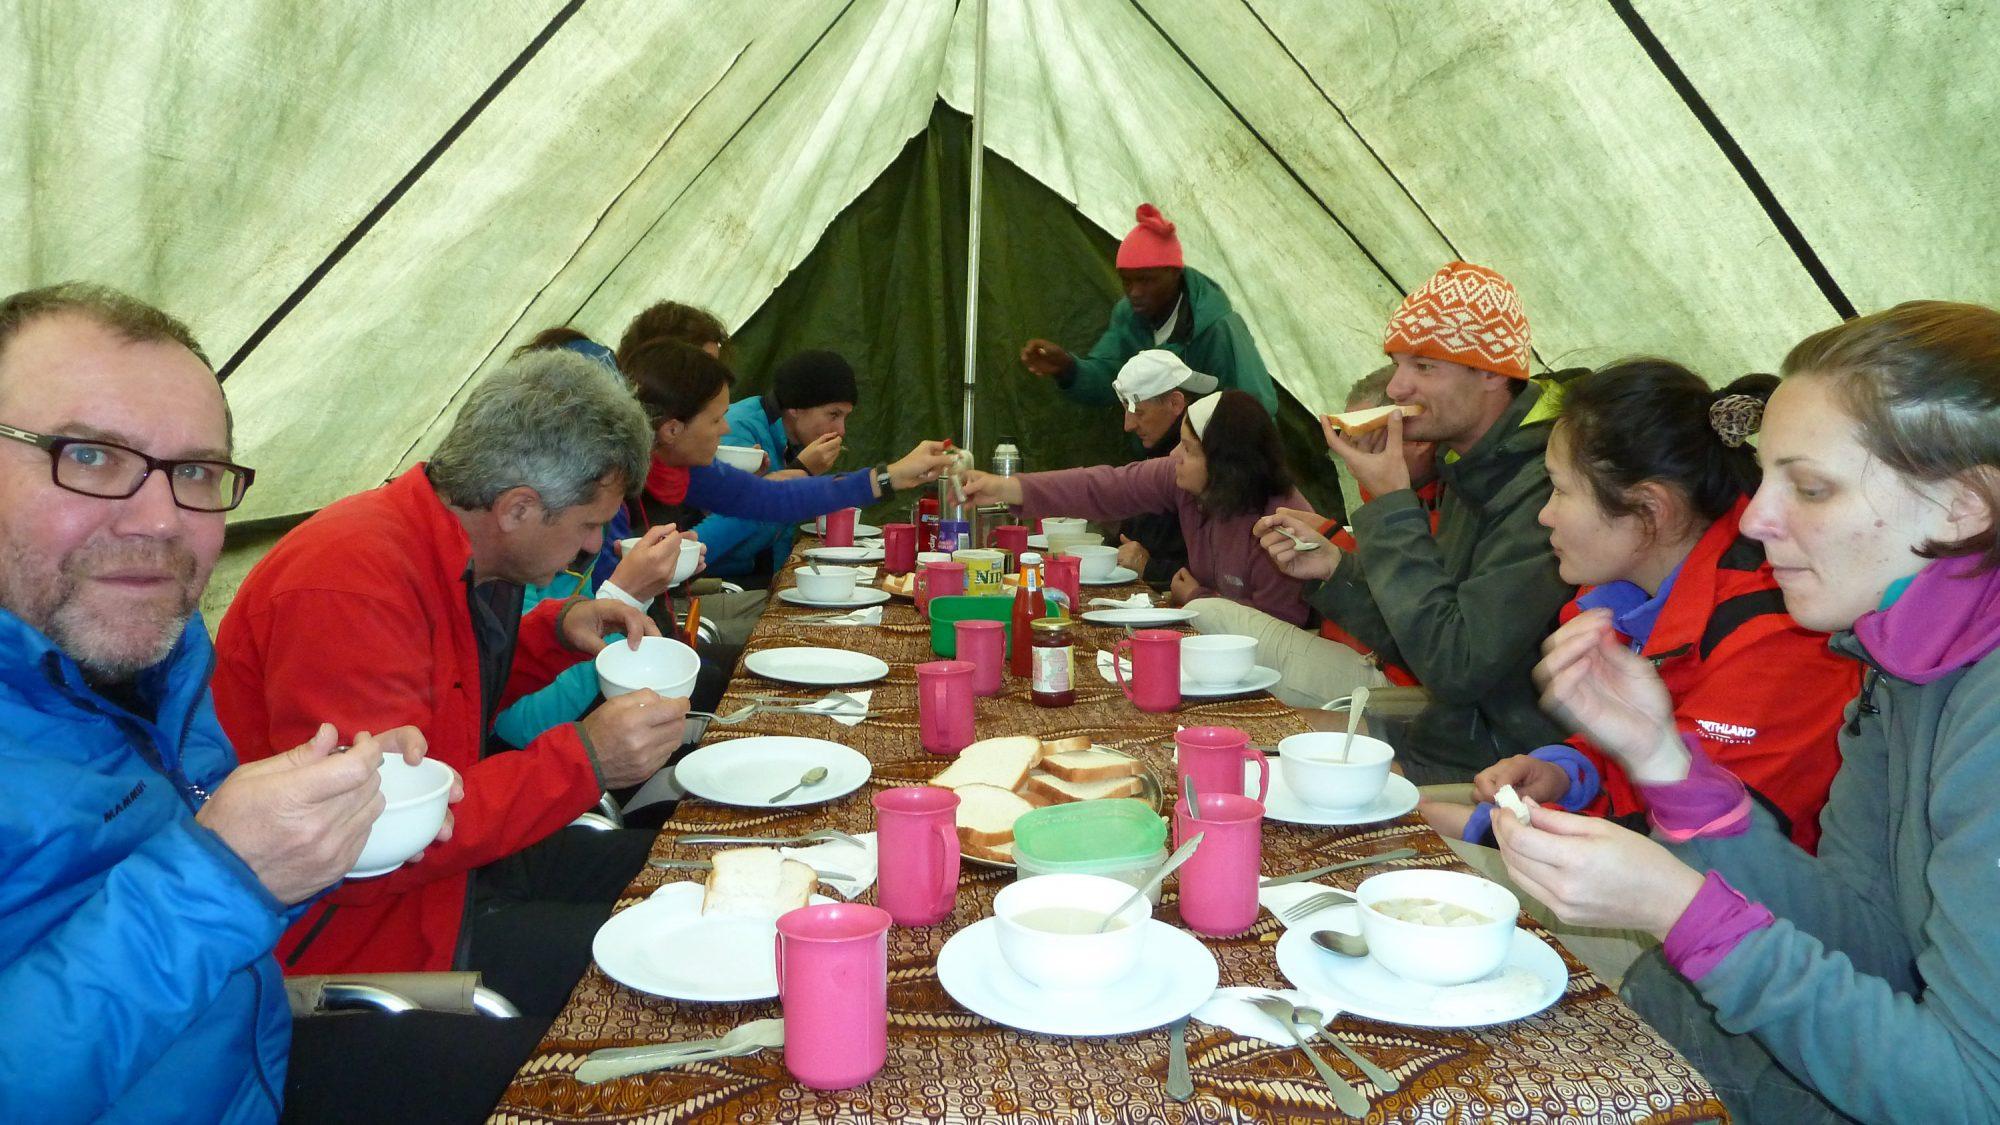 Essen im Zelt, Kilimandscharo, Kilimandscharo besteigen, Tansania, Afrika, Kilimandscharo Tour, Erfahrungsbericht, Machame Route